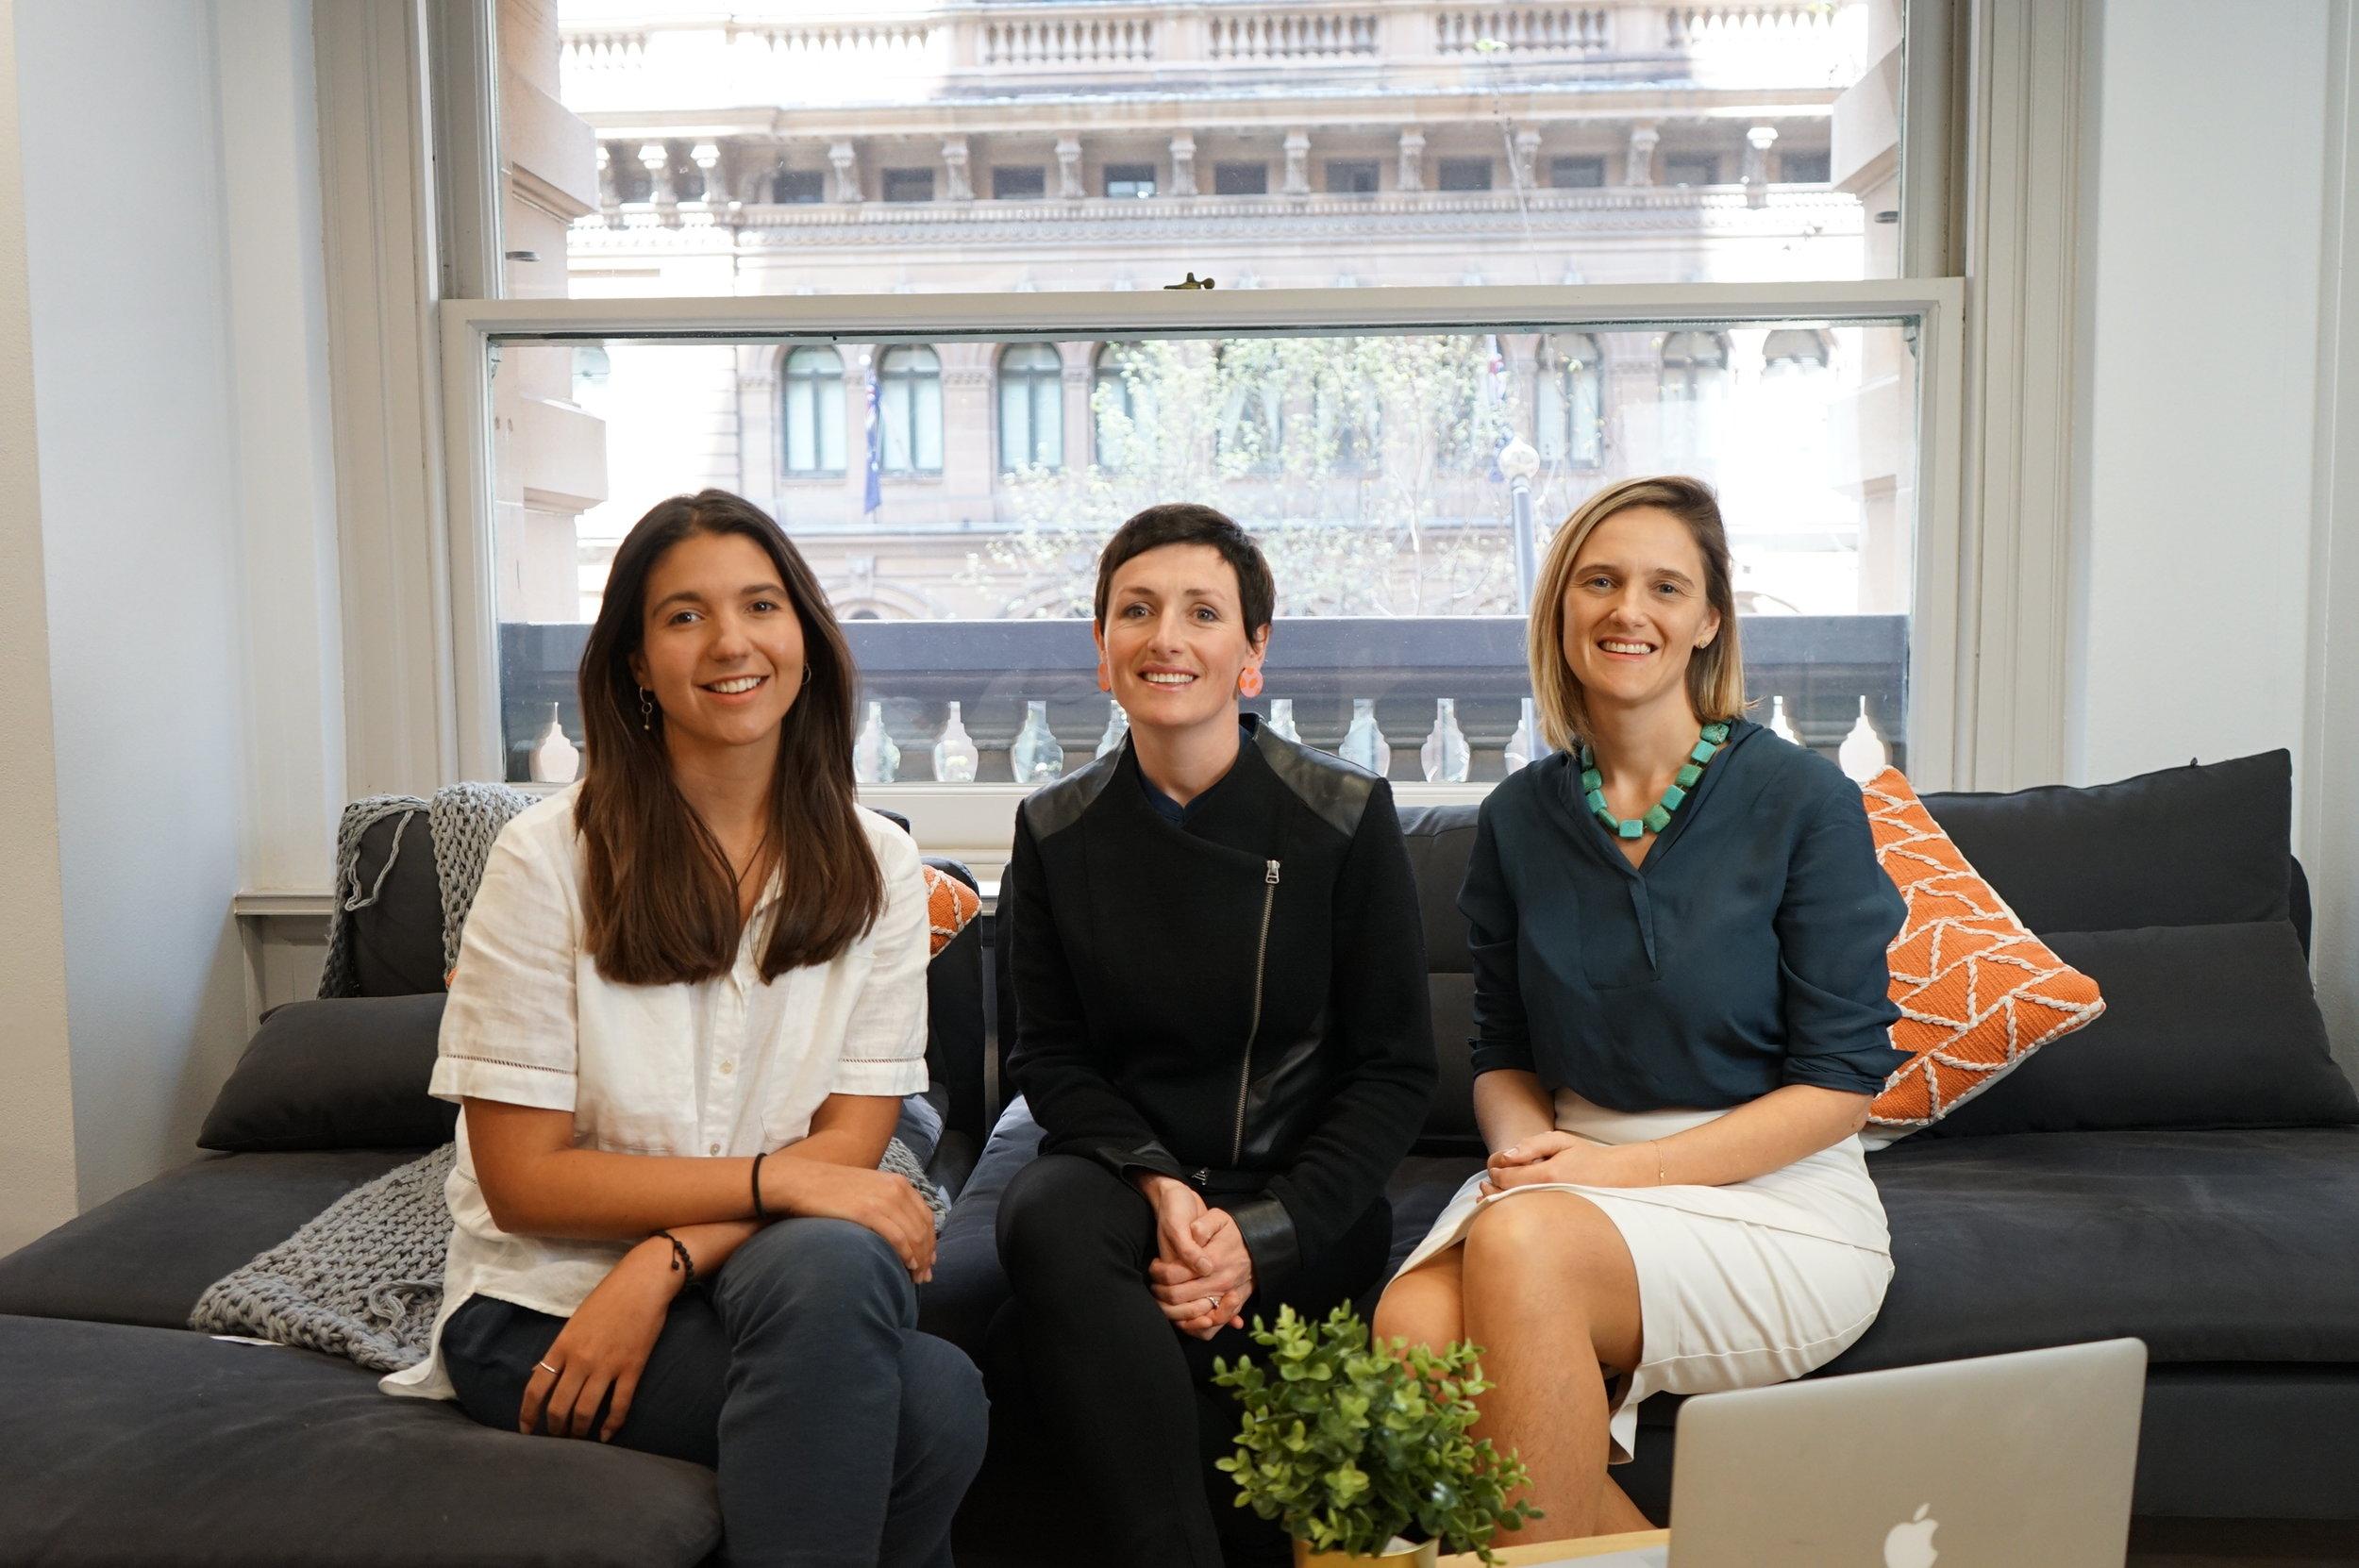 Alex, Zoe & Chrissy - Founders of Verve Super.